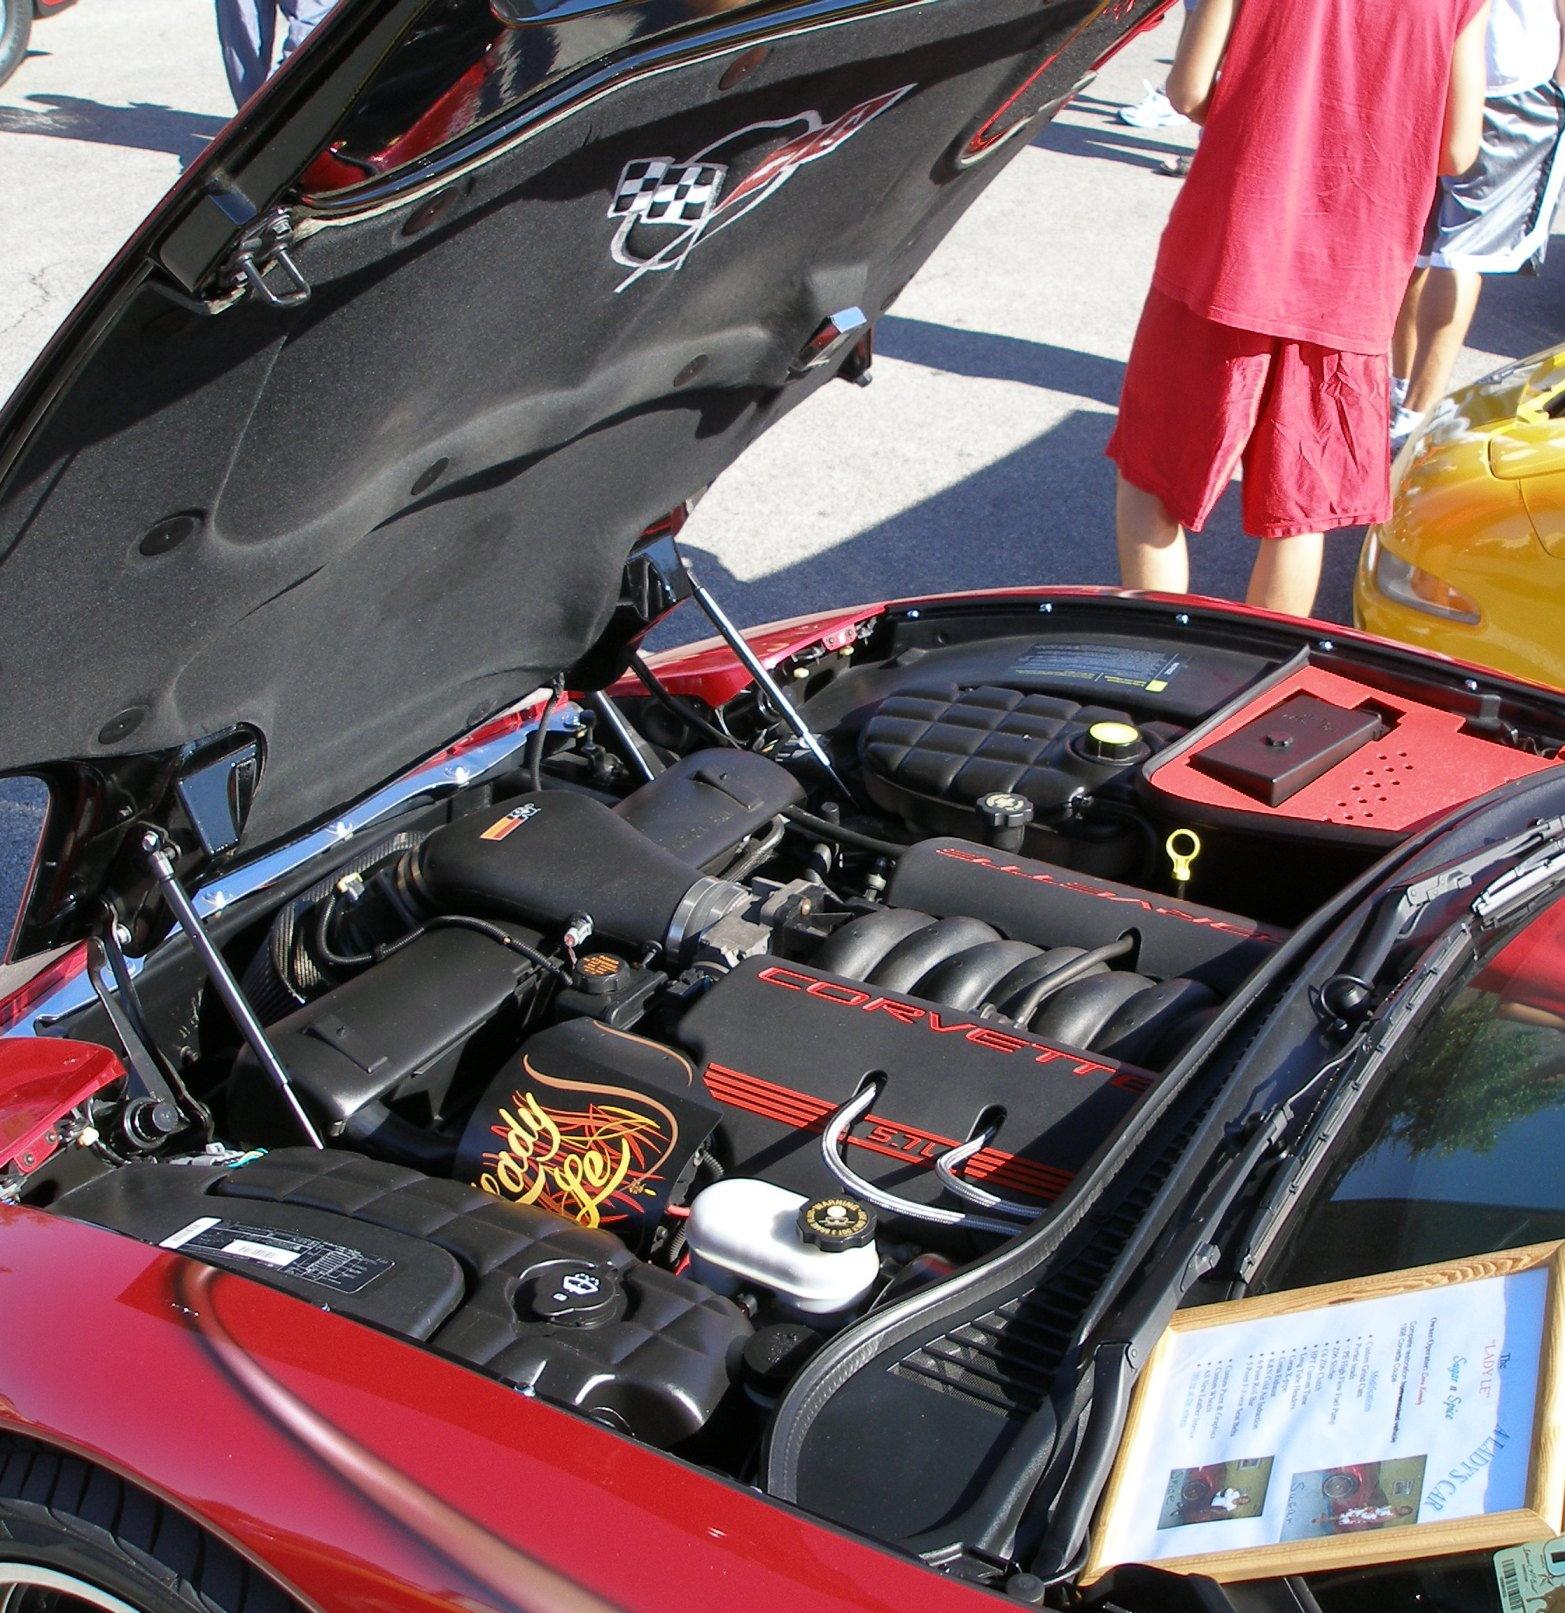 Leoras Corvette Engine Bay Detail